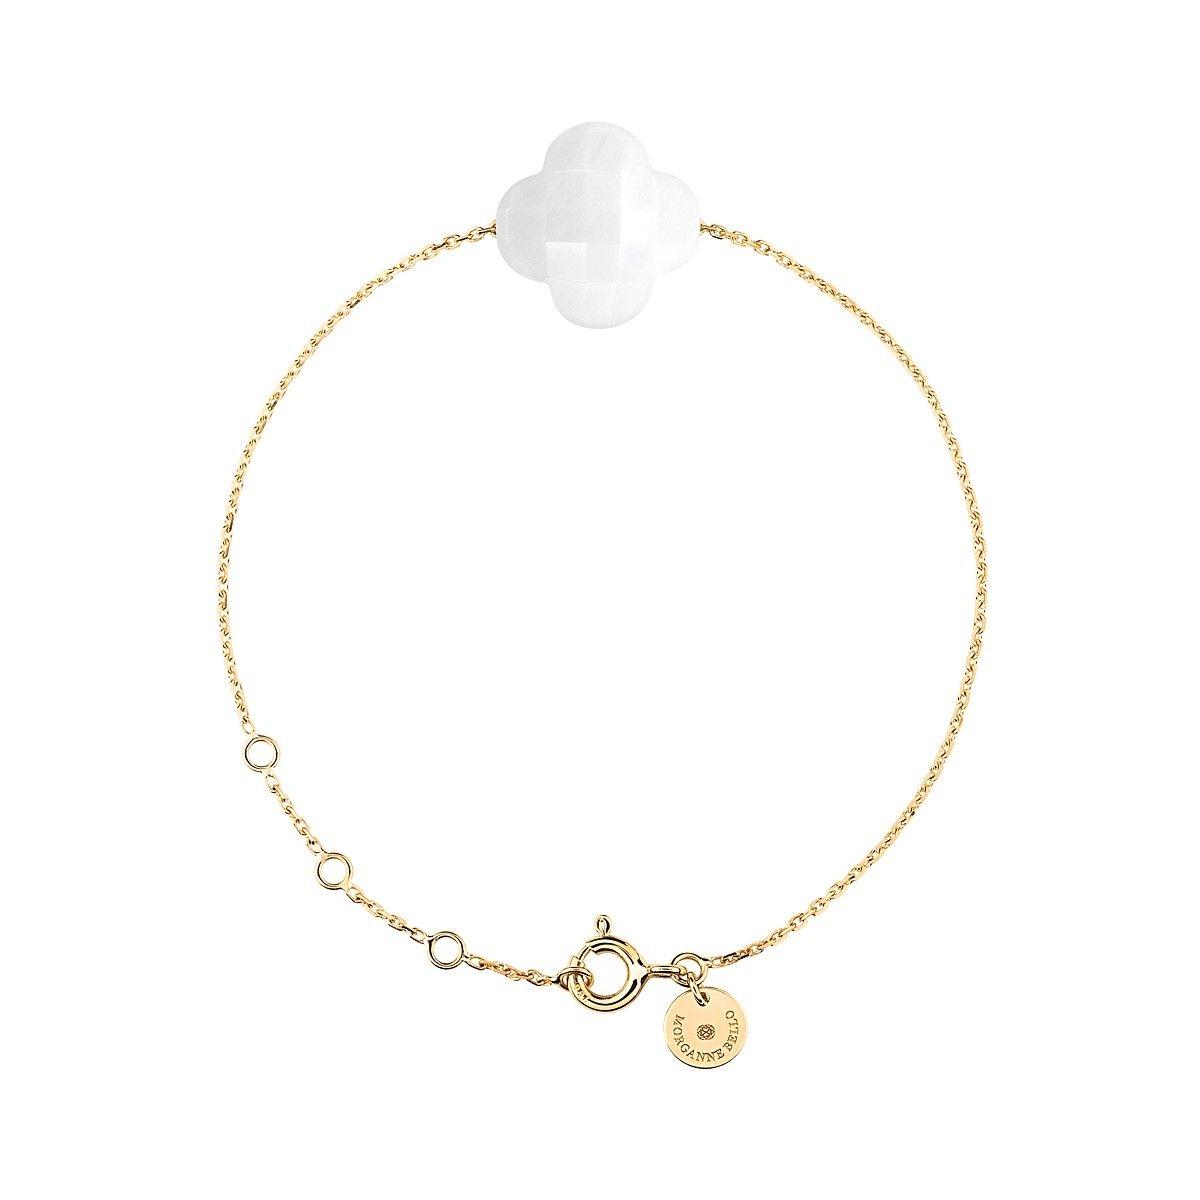 Bracelet Or Jaune Trefle Agate Blanche